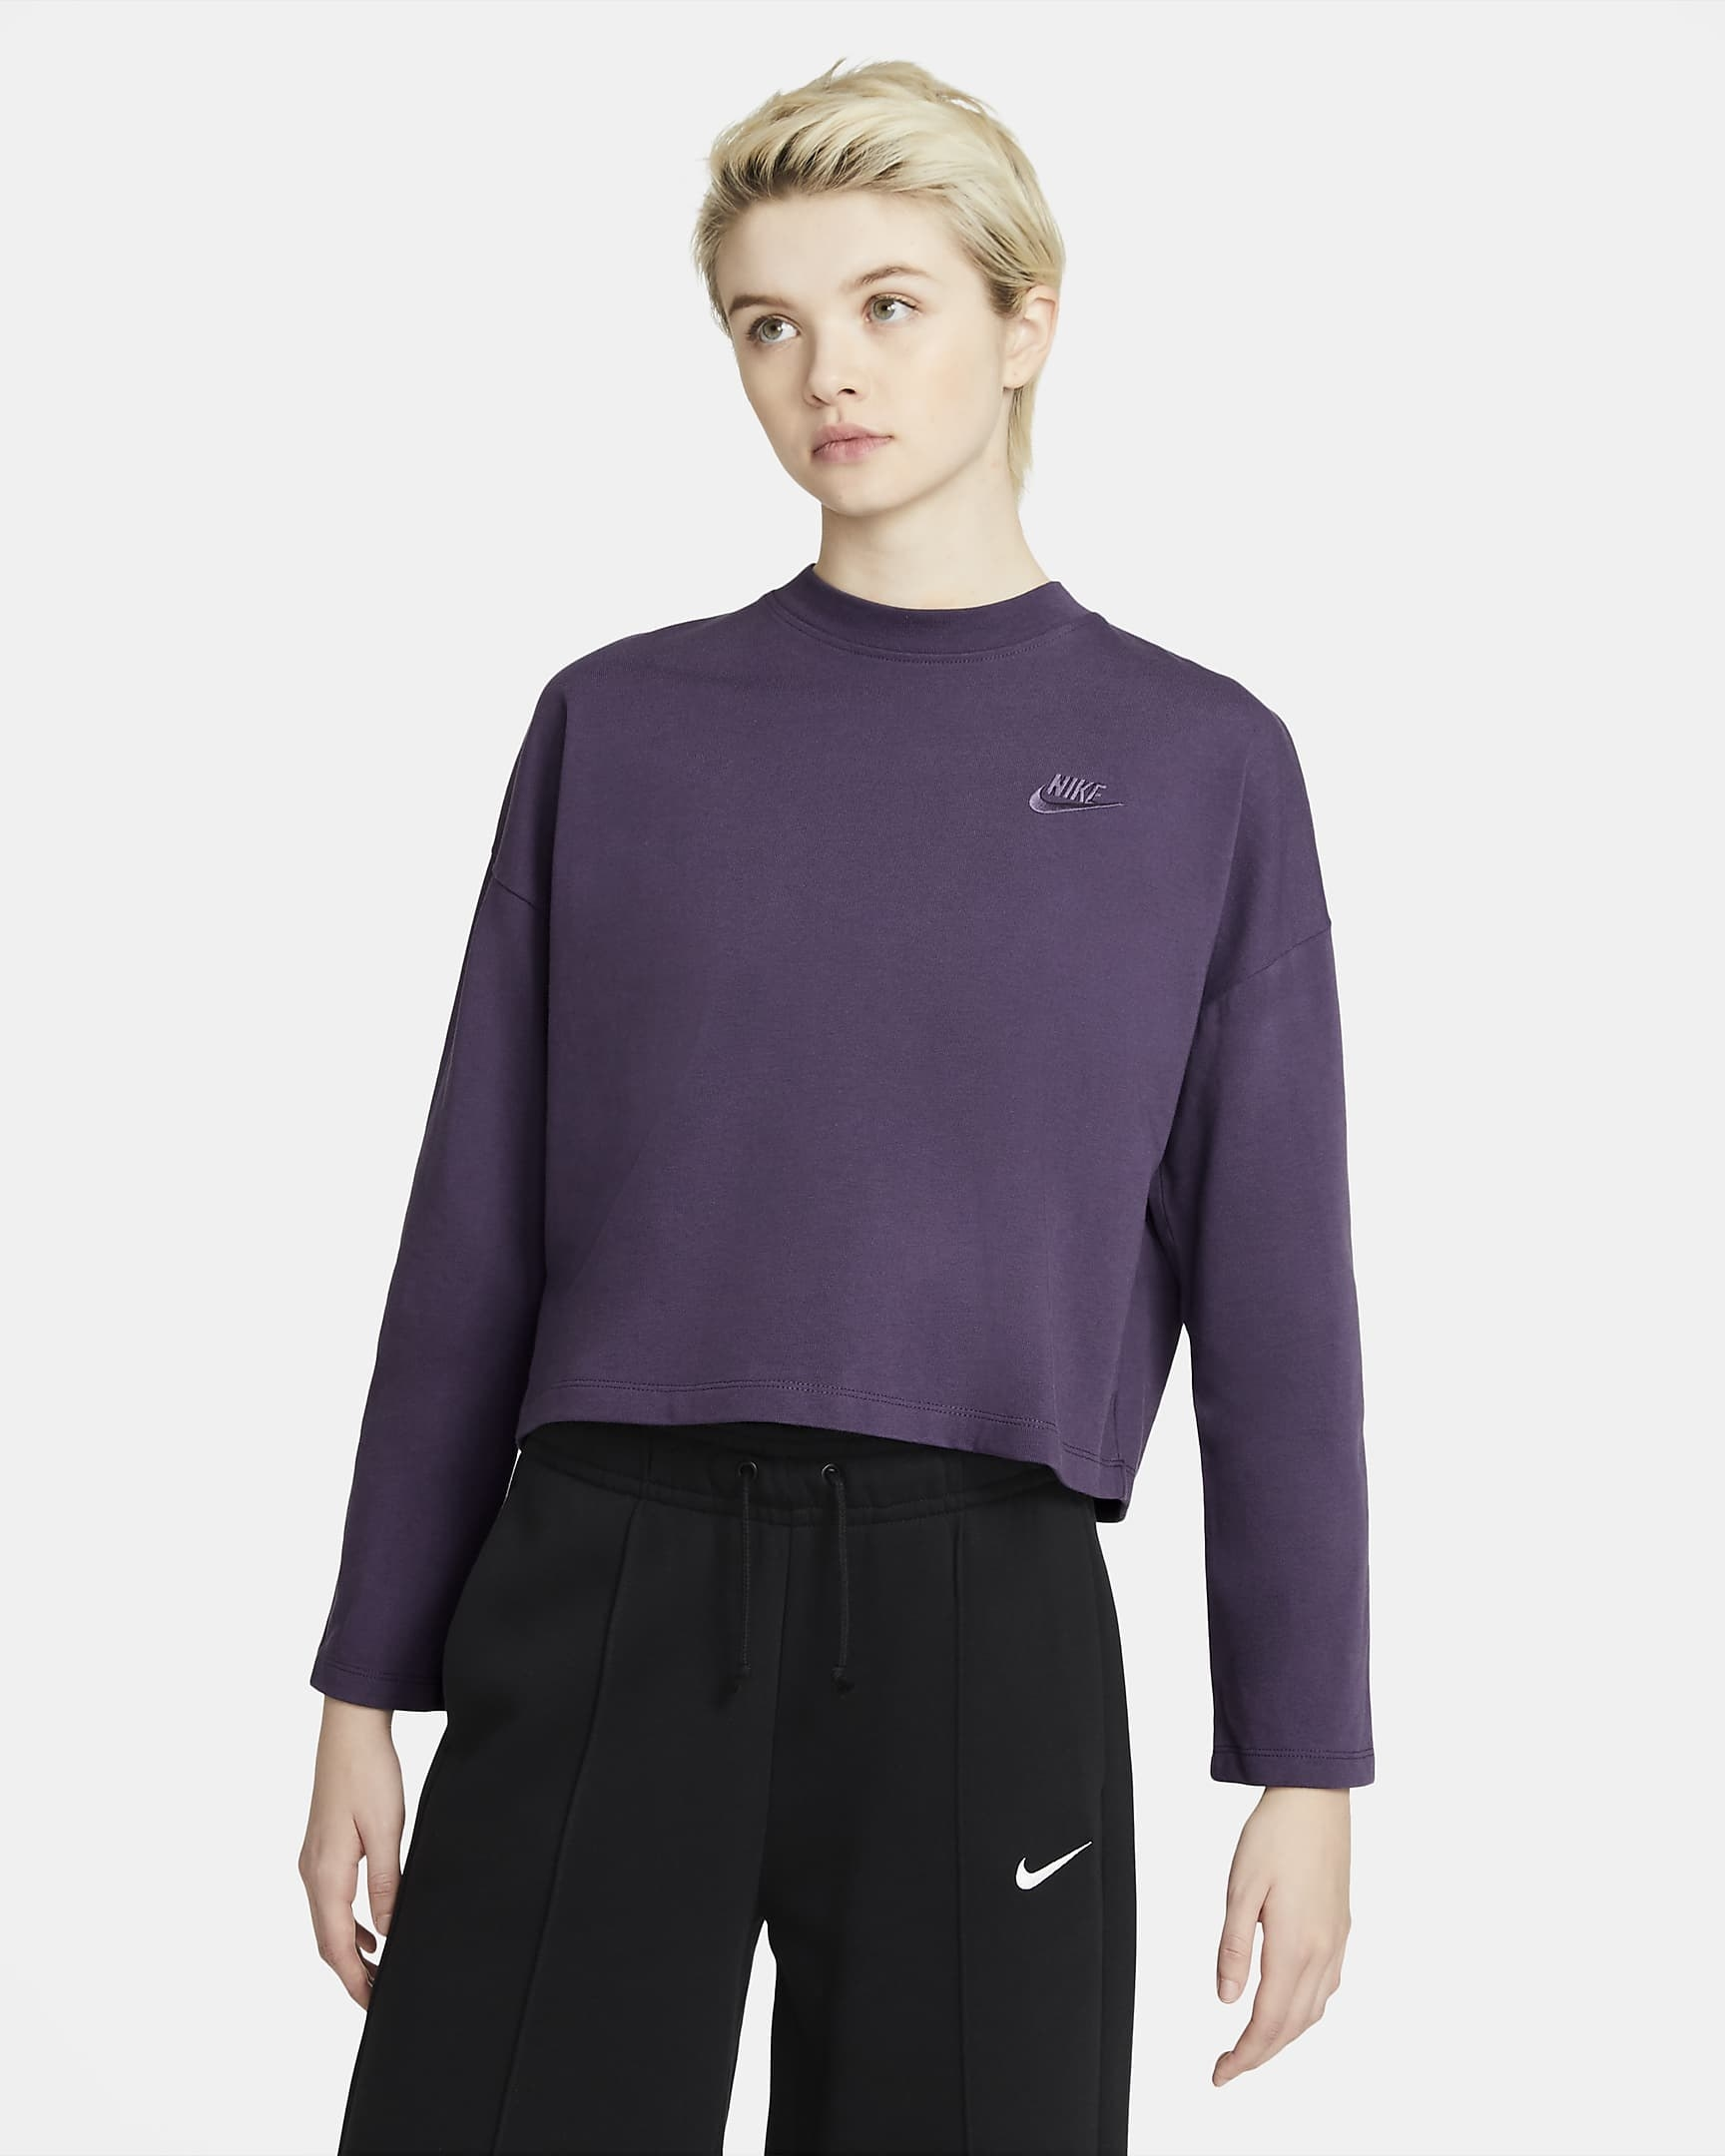 model wearing purple nike crop top